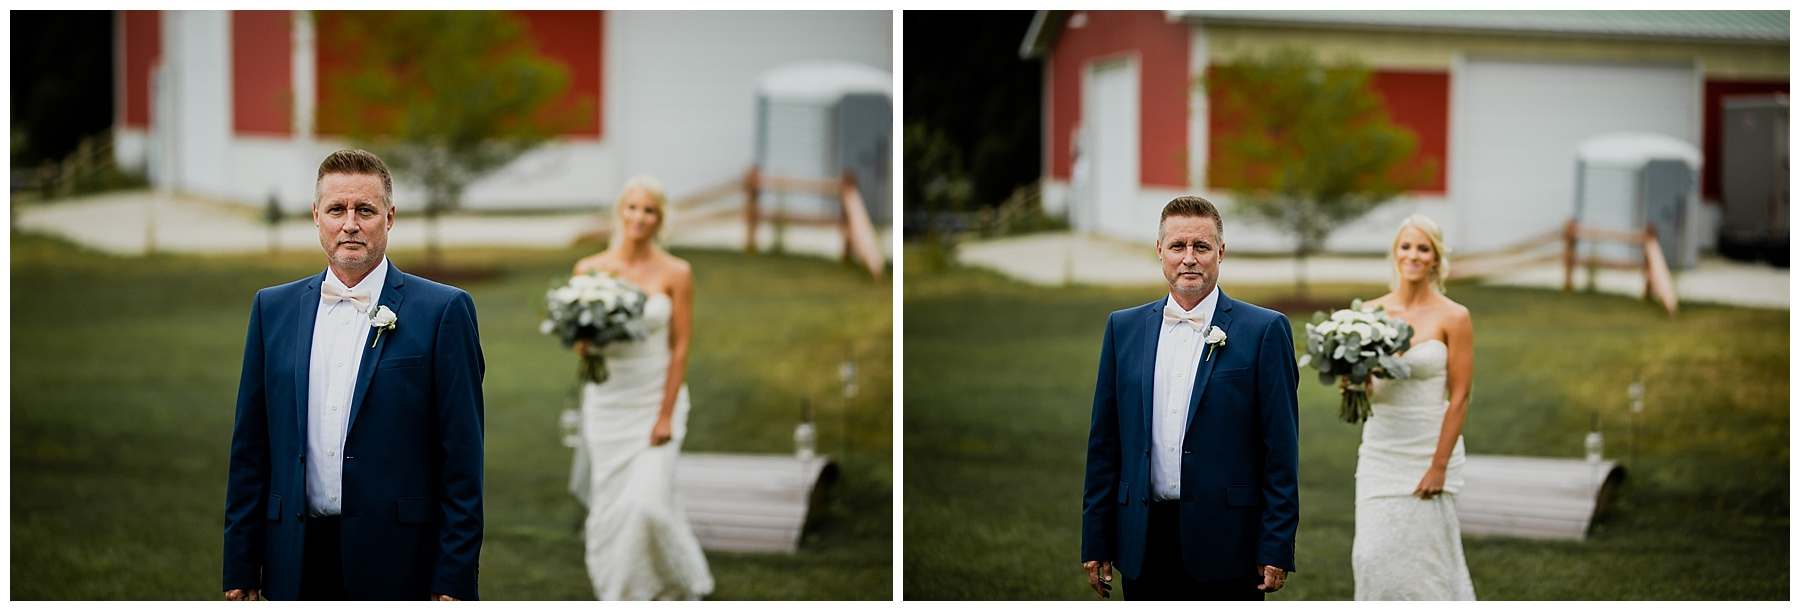 WISCONSIN WEDDING PHOTOGRAPHER 62.jpg